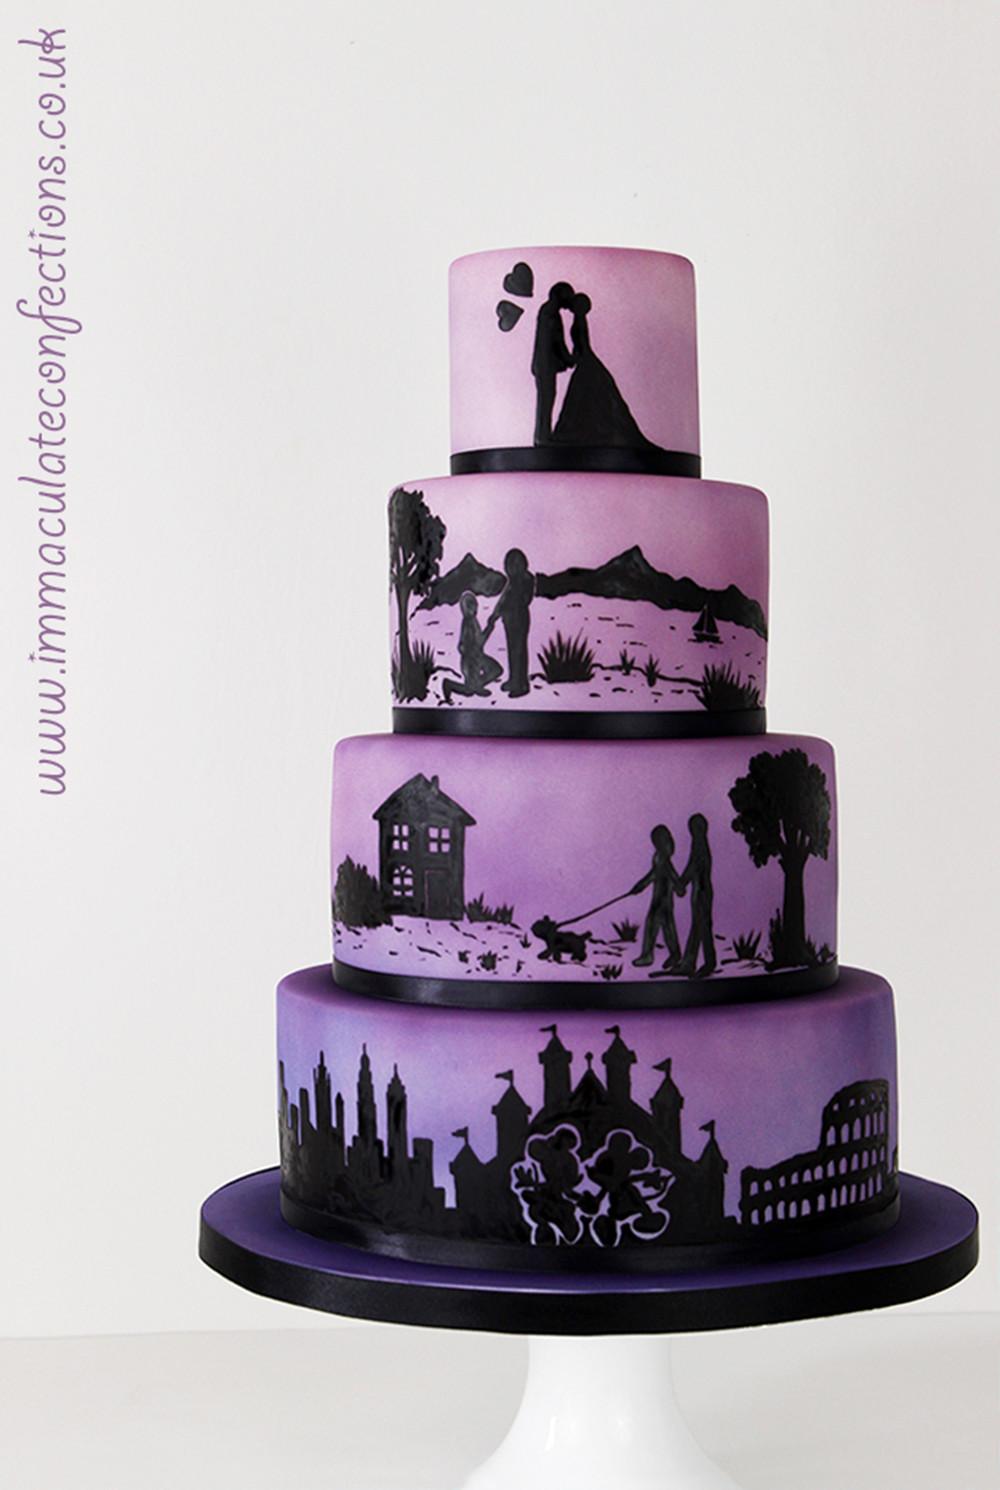 Silhouette Wedding Cakes  Ombré Silhouette Wedding Cake Cakes by Natalie Porter